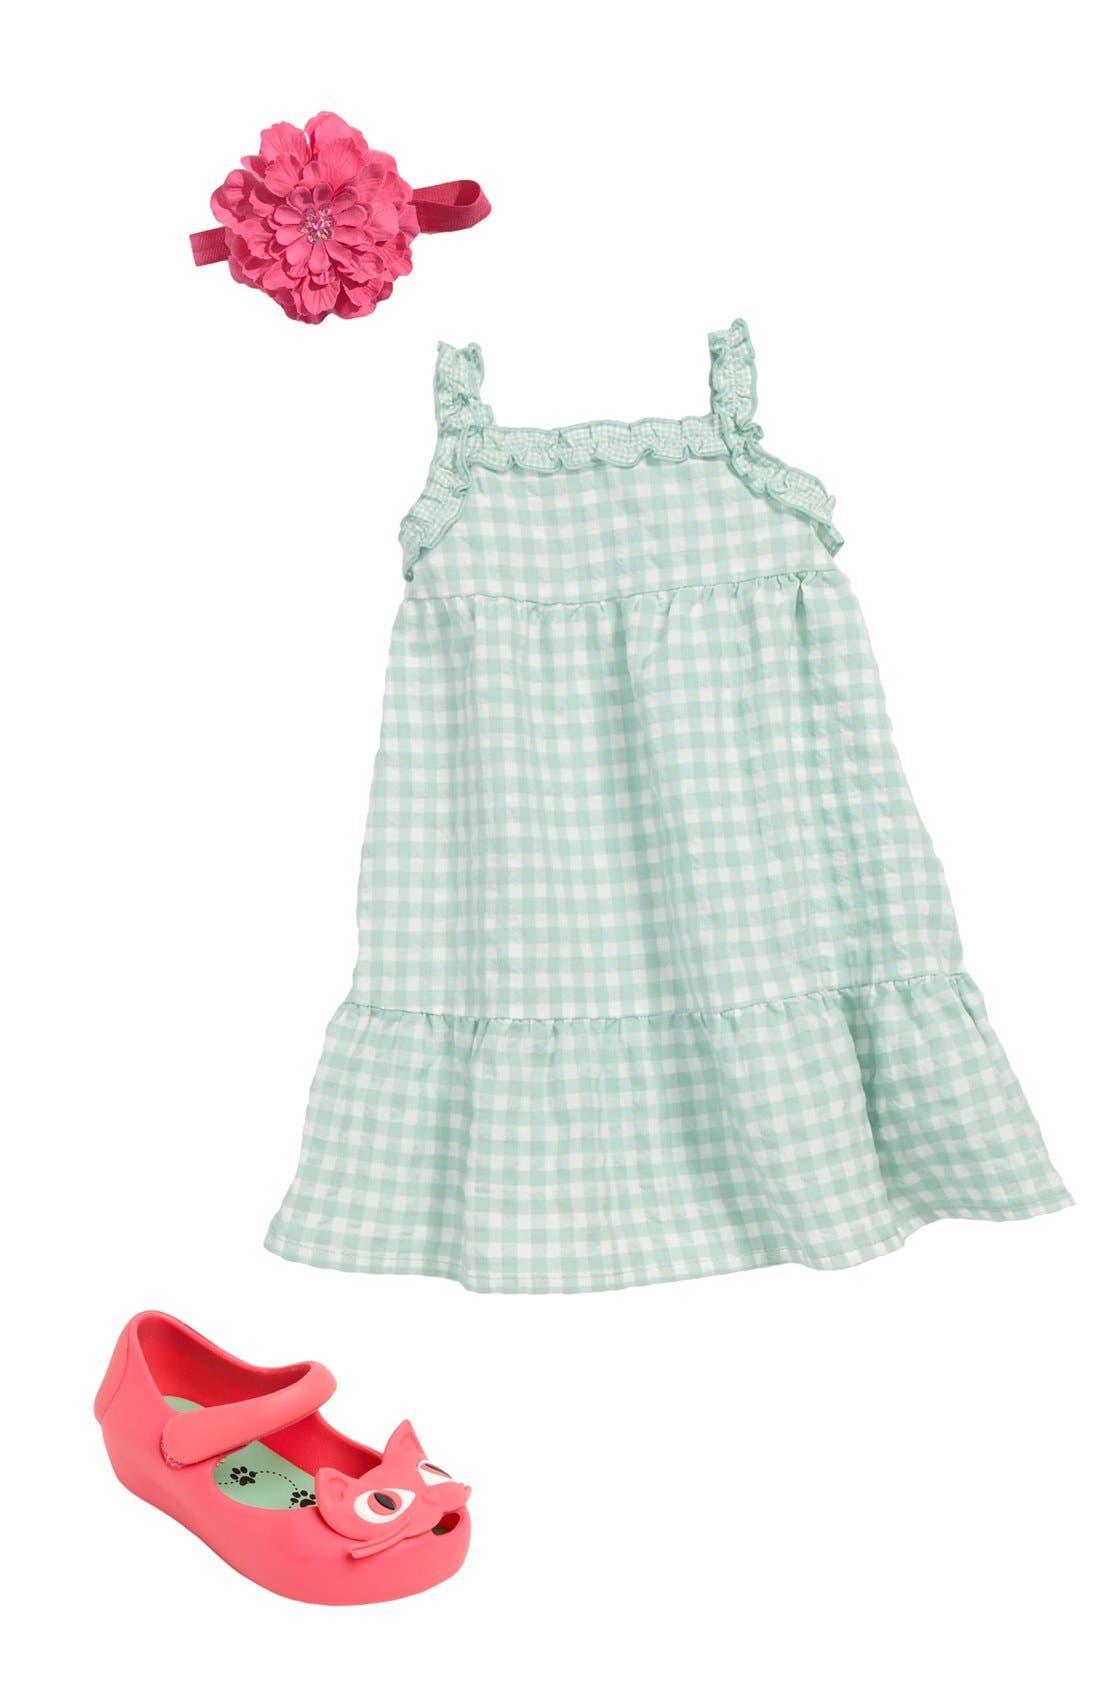 Alternate Image 1 Selected - United Colors of Benetton Kids Dress, PLH Bows & Laces Headband & Mini Melissa Slip-On (Infant)